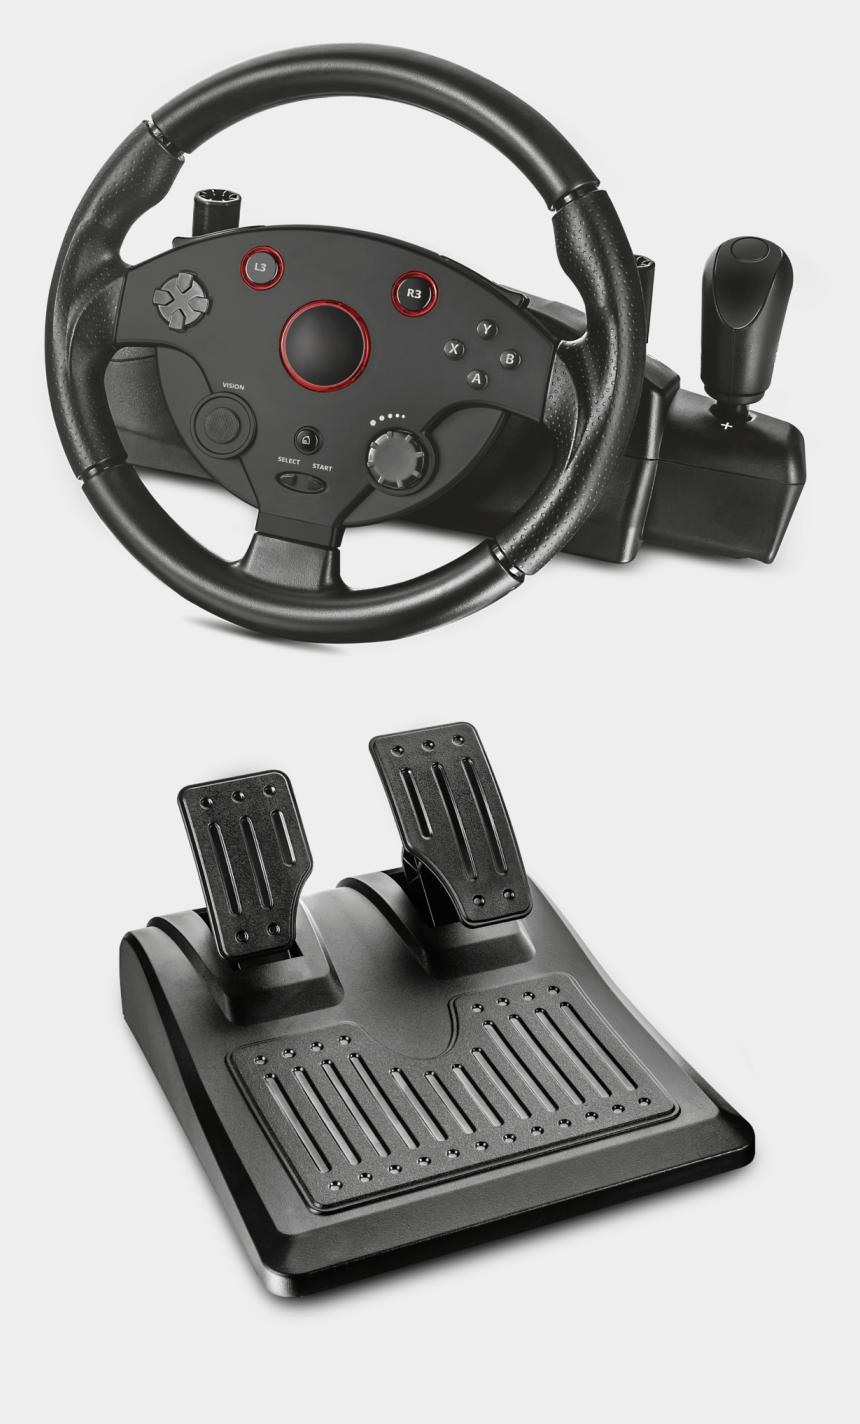 hands on steering wheel clipart, Cartoons - Steering Wheel - Volante Trust Gaming Gxt 288